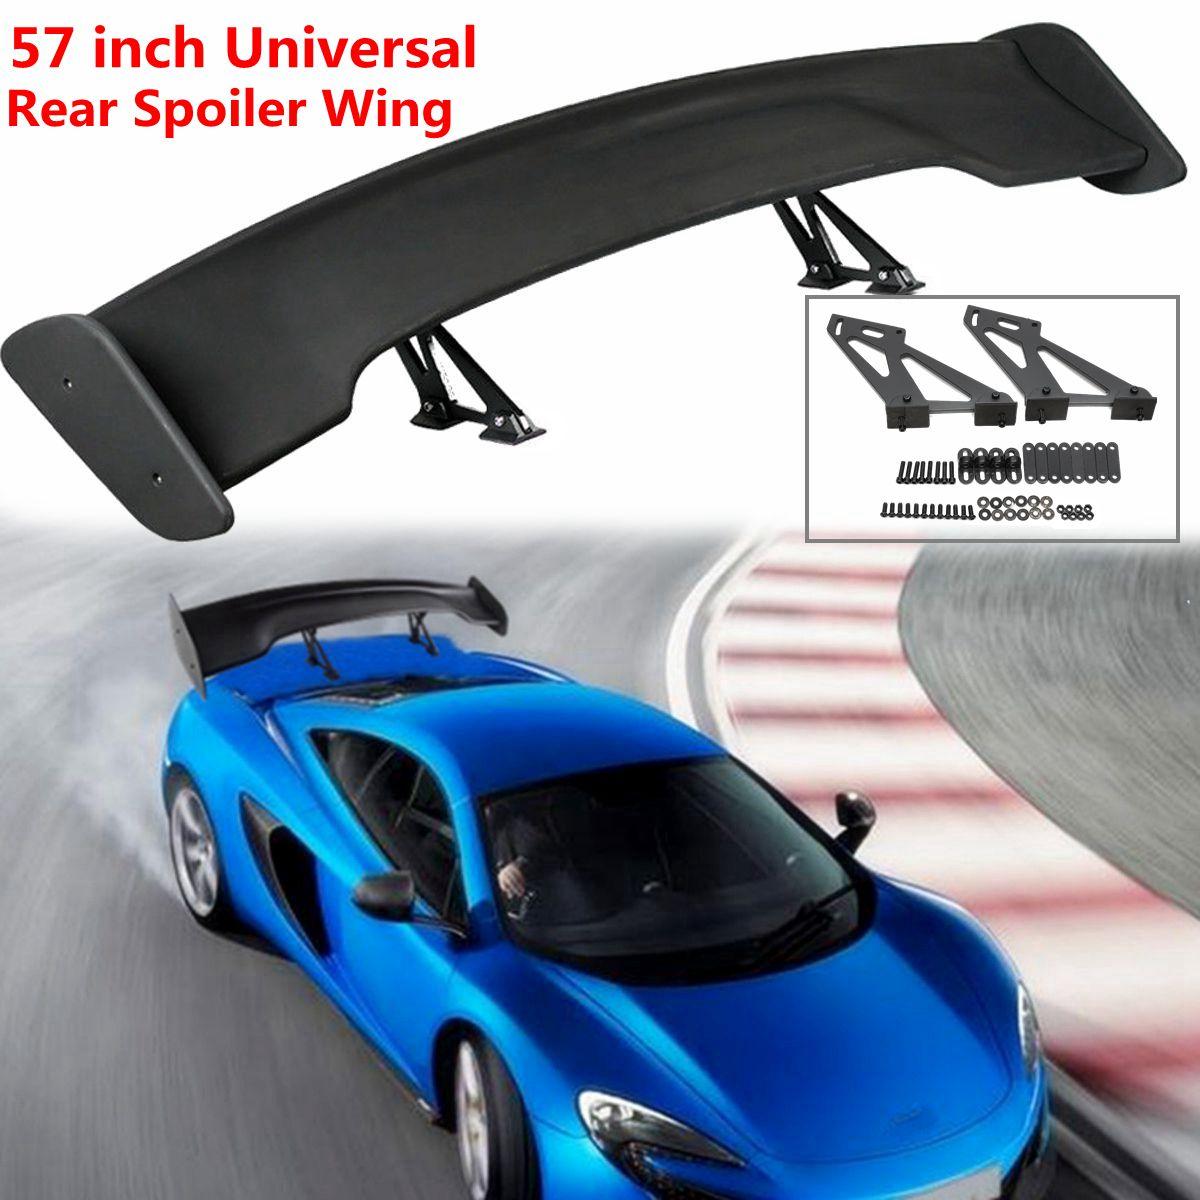 57 Black Universal Dumb Black Adjustable Car Light Weight GT Rear Wing Spoiler Tail Trunk Lid Lip for BMW/Benz57 Black Universal Dumb Black Adjustable Car Light Weight GT Rear Wing Spoiler Tail Trunk Lid Lip for BMW/Benz